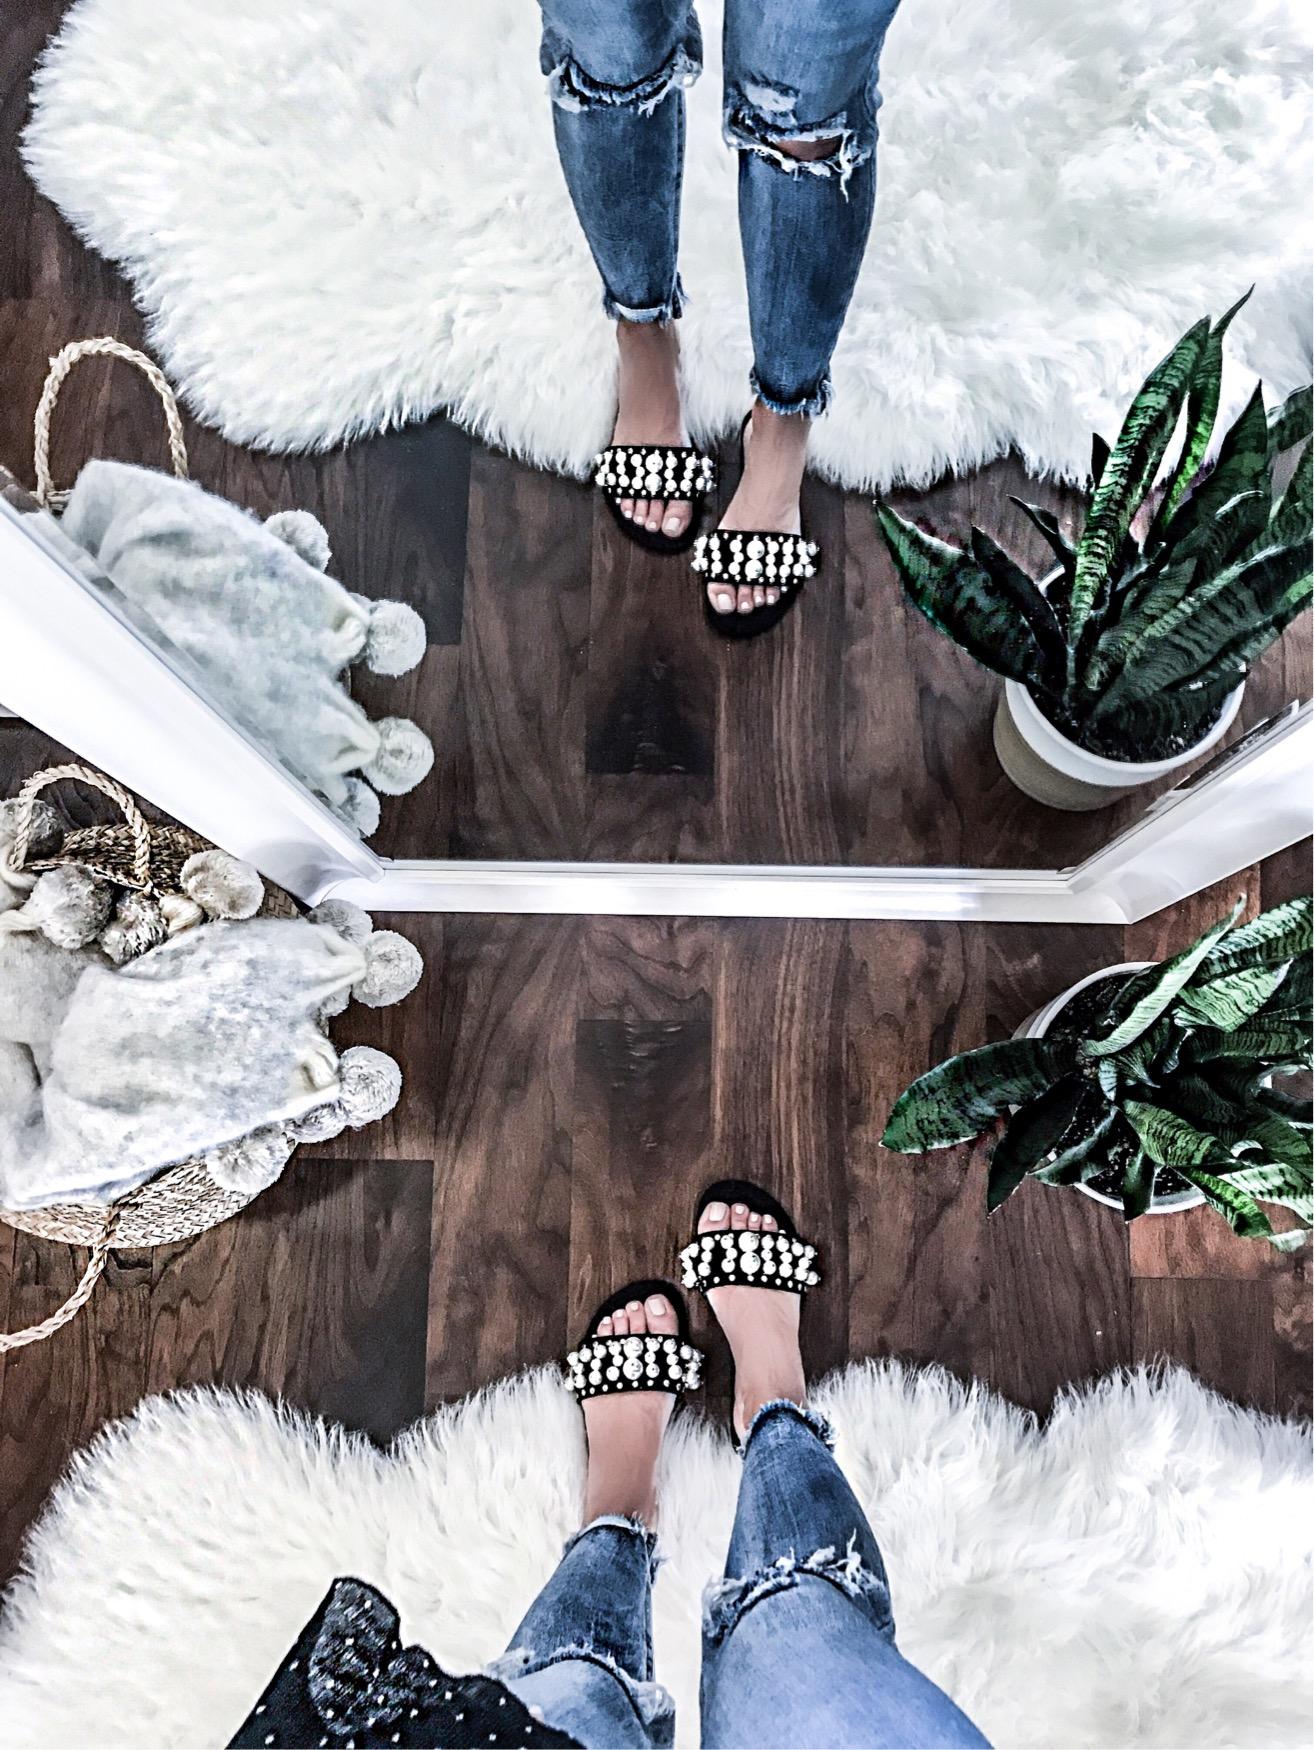 Houston fashion and lifestyle blogger Tiffany Jais